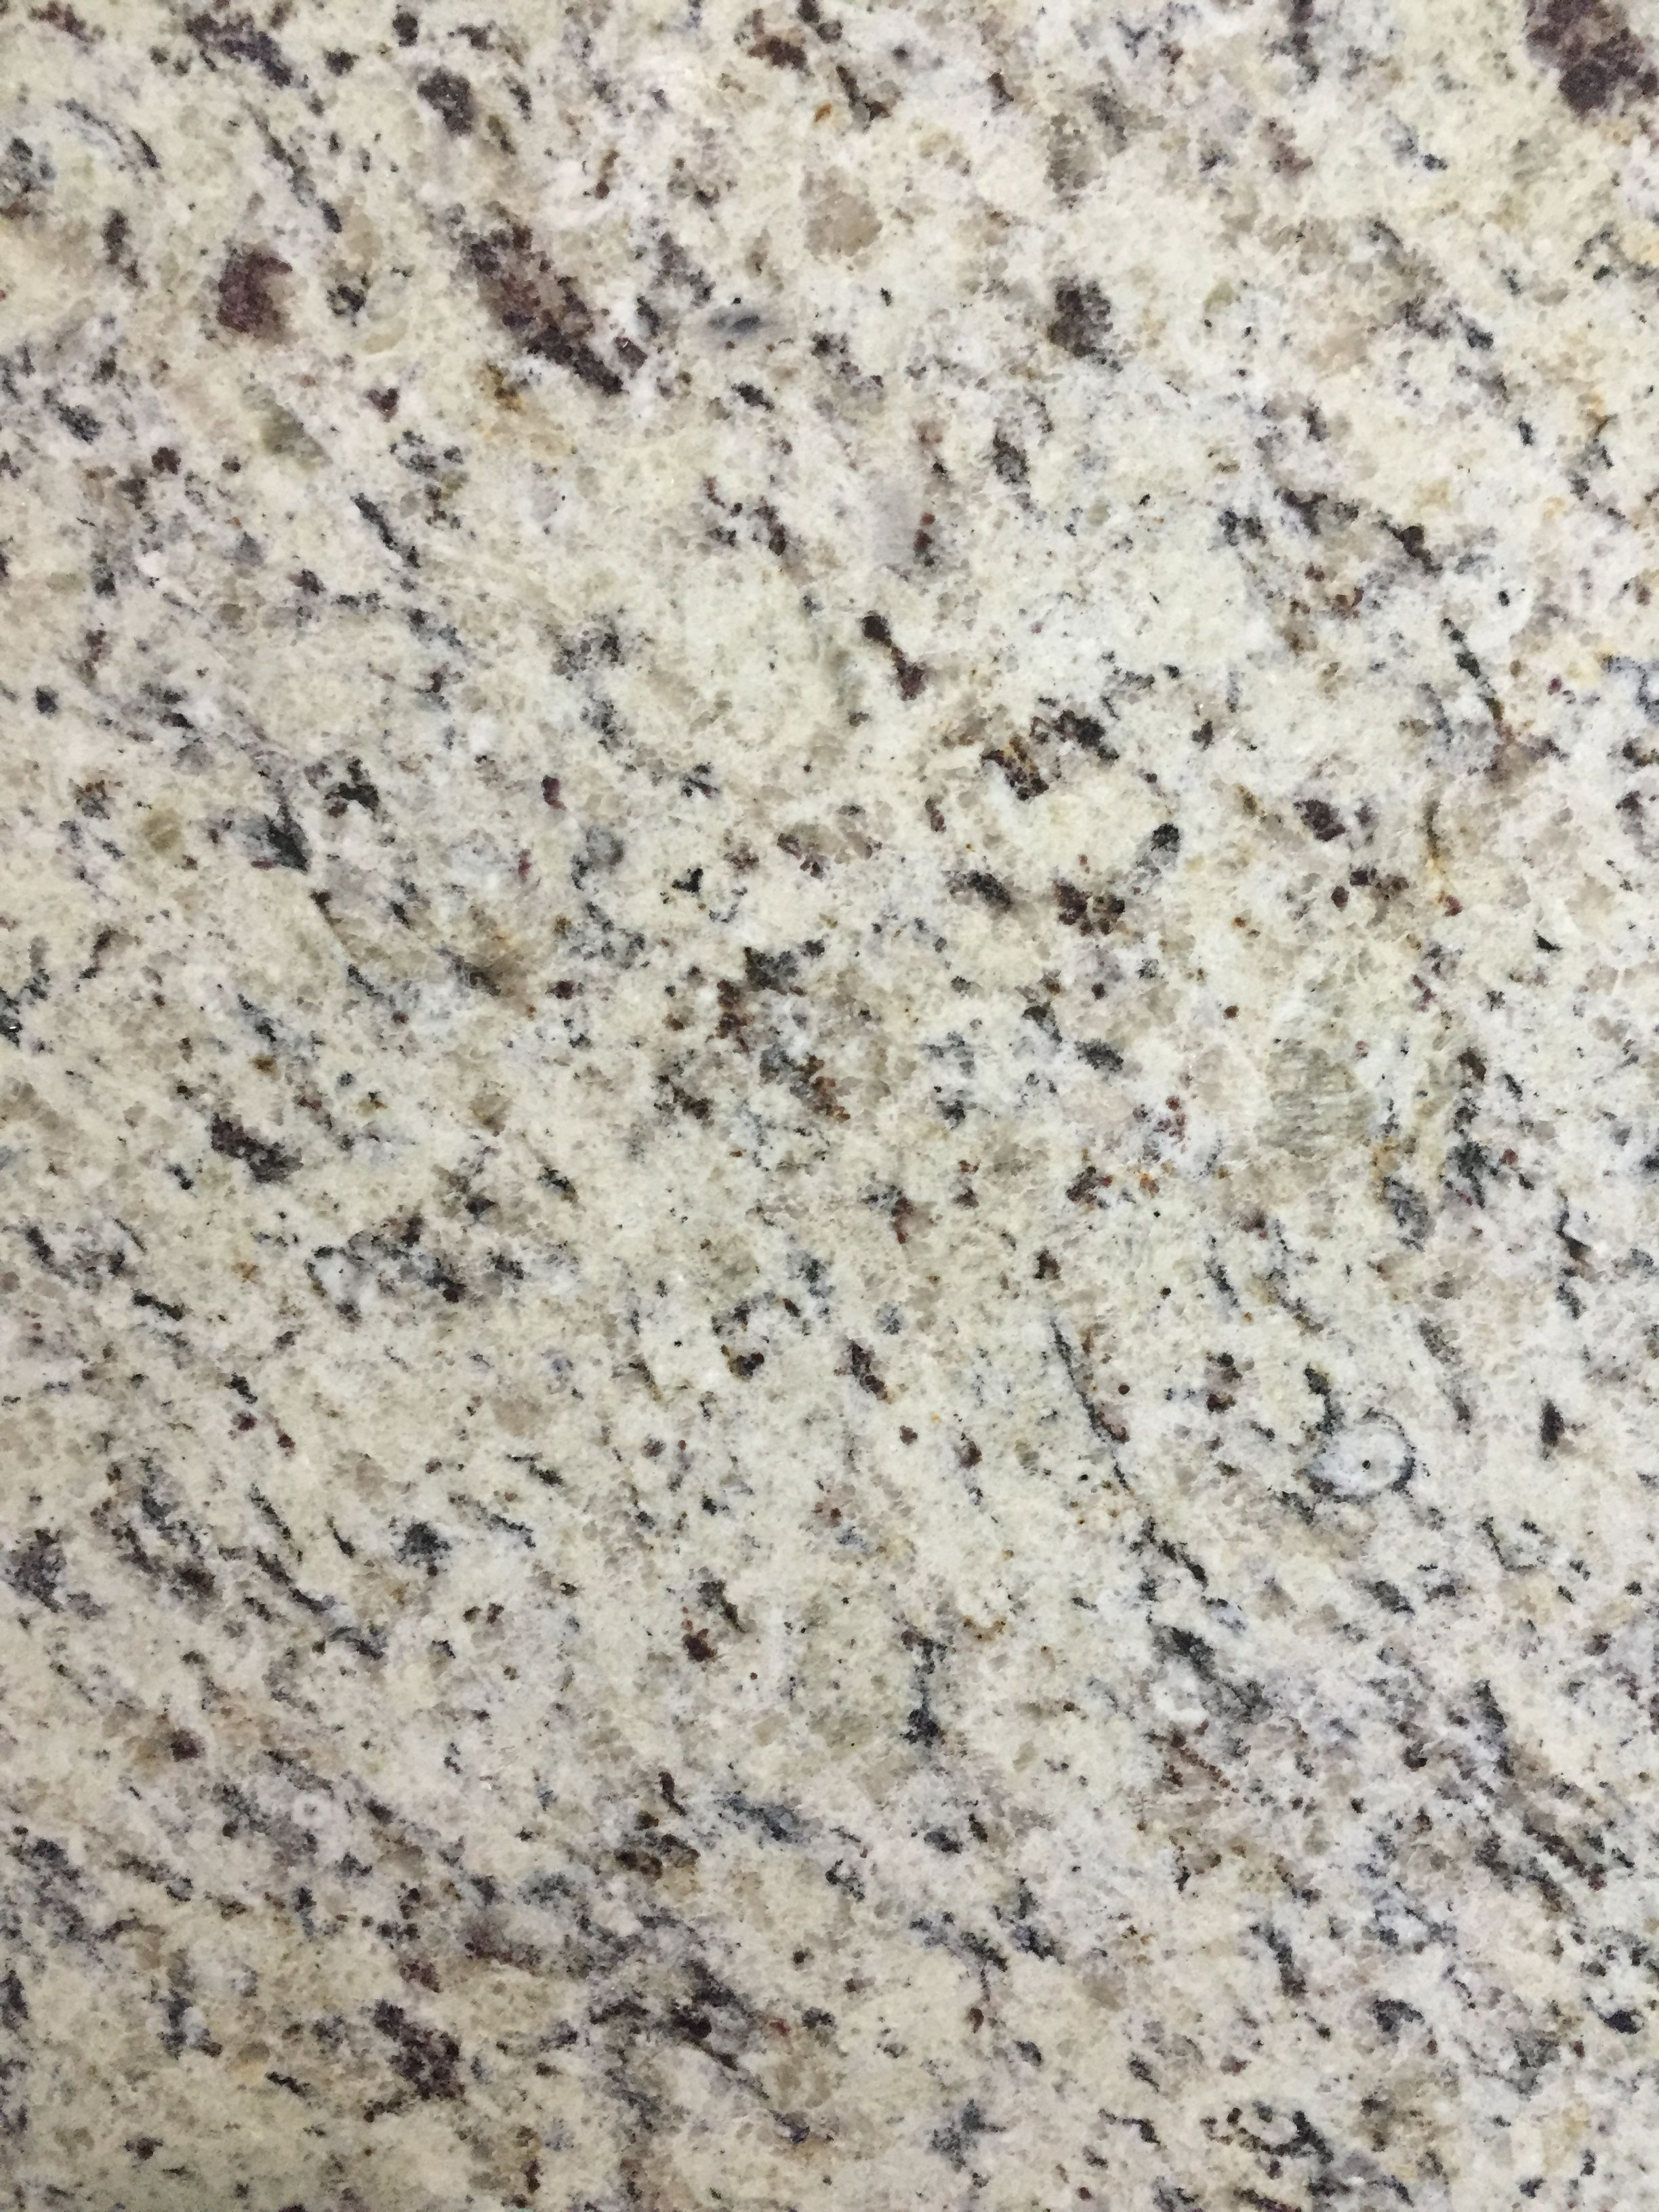 Giallo Verona Granite #countertop #countertops #granitecountertops #marblecountertops #naturalstone #bathroomdesign #bathdesign #bathroomdesigners #kitchendesign #goodfellasgranitellc